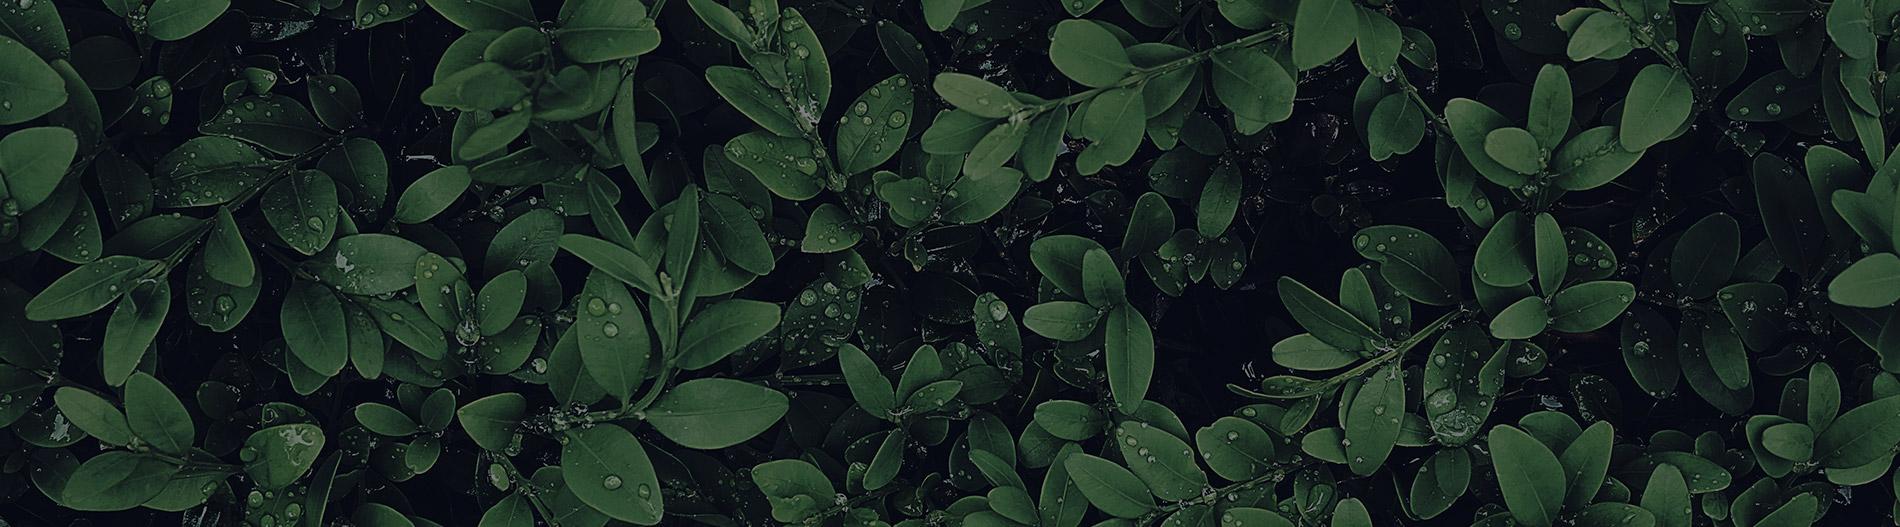 Singapore Botanic Gardens | Event Butler